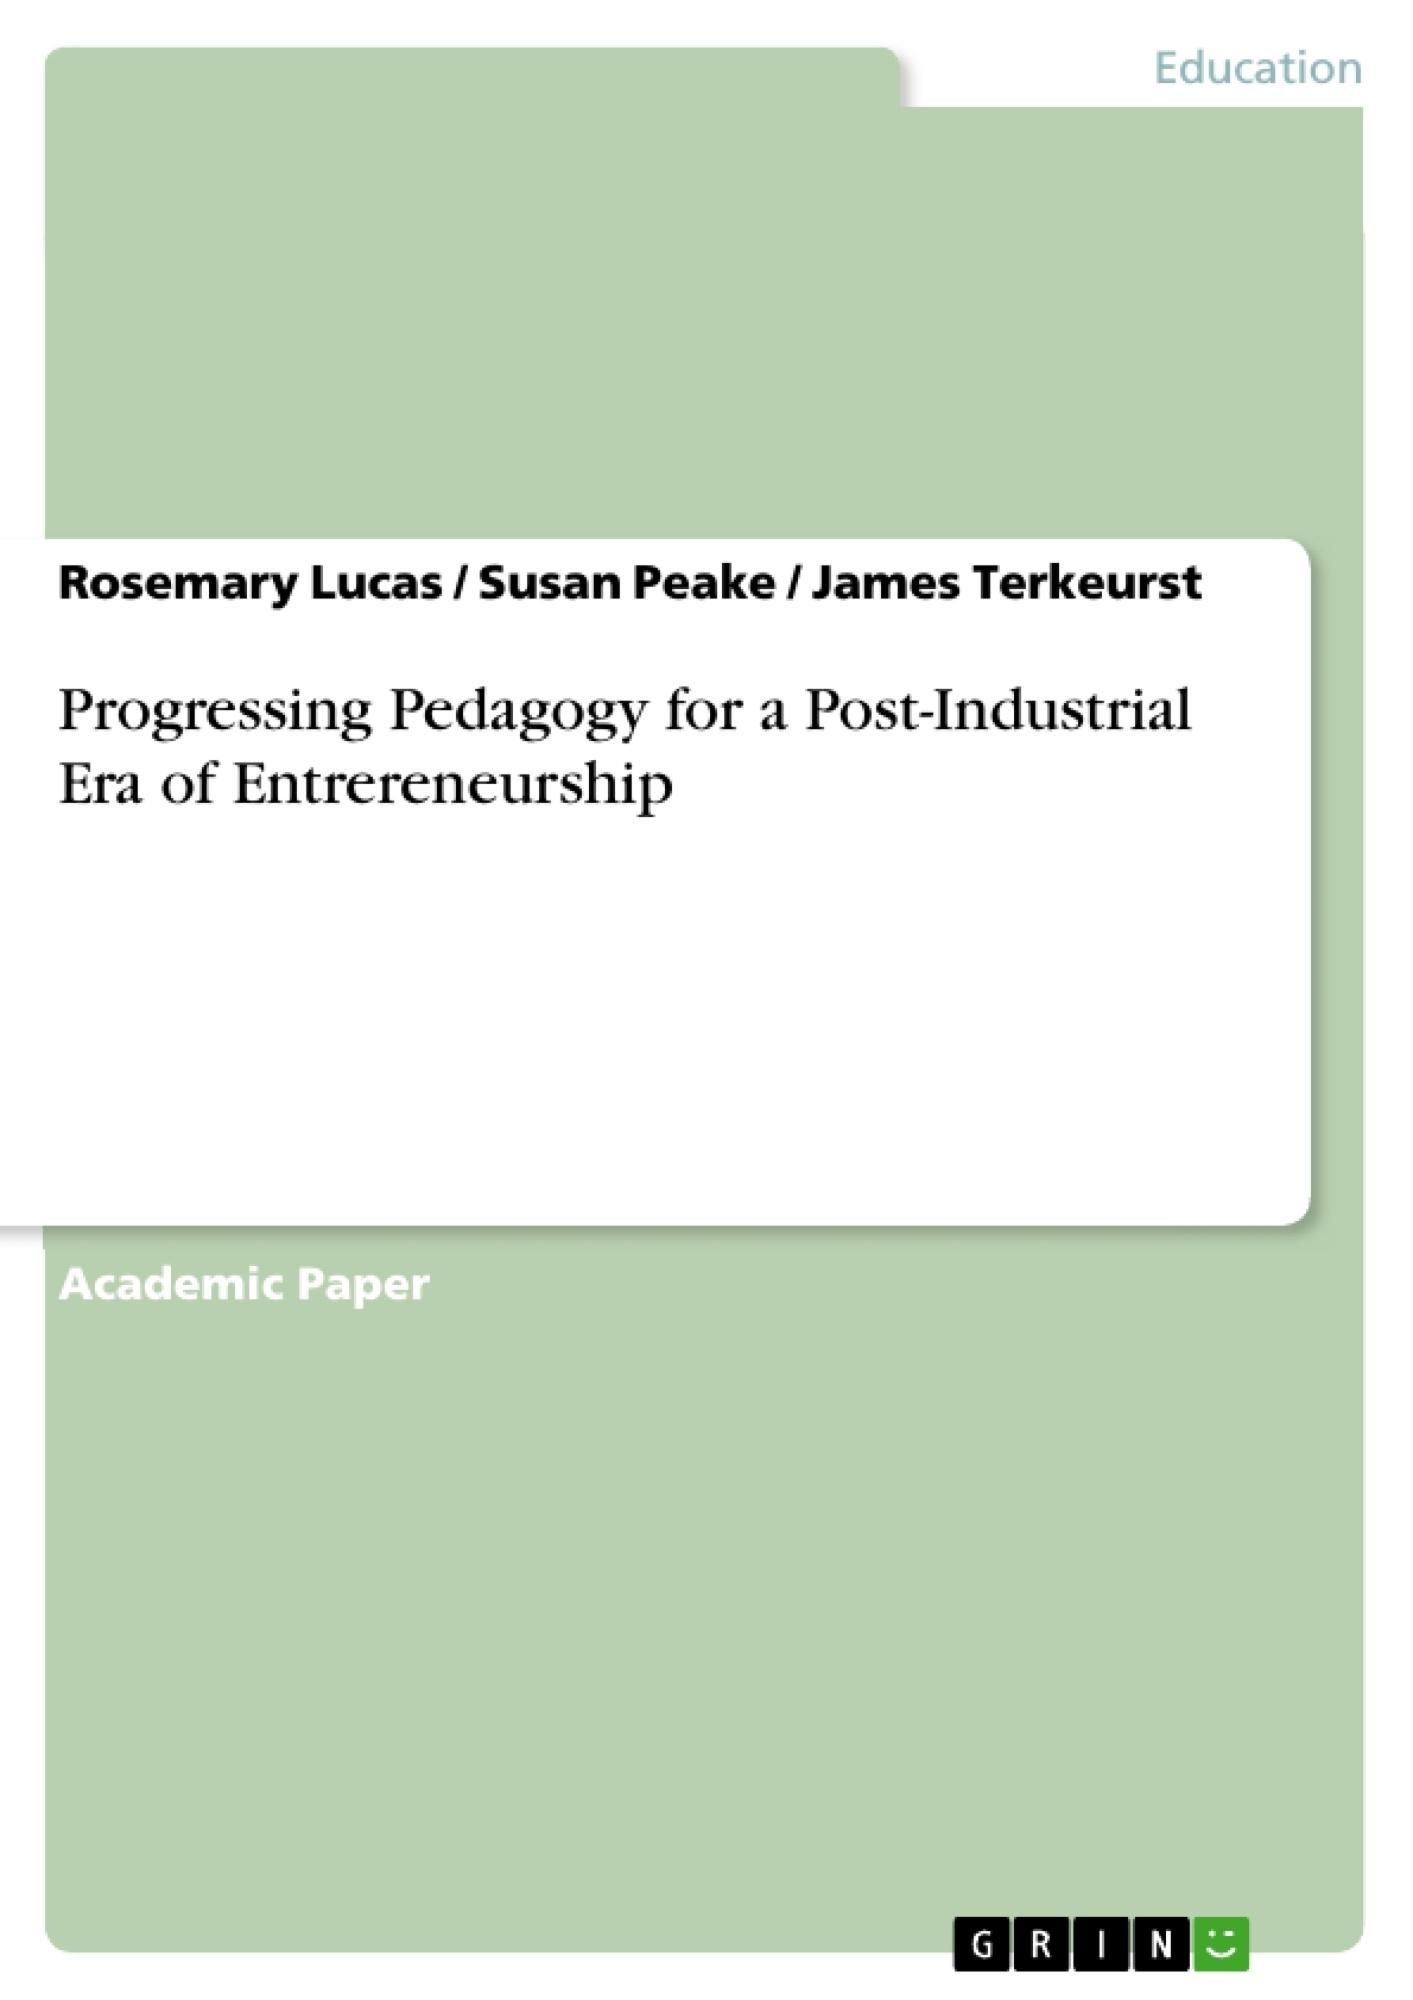 Title: Progressing Pedagogy for a Post-Industrial Era of Entrereneurship